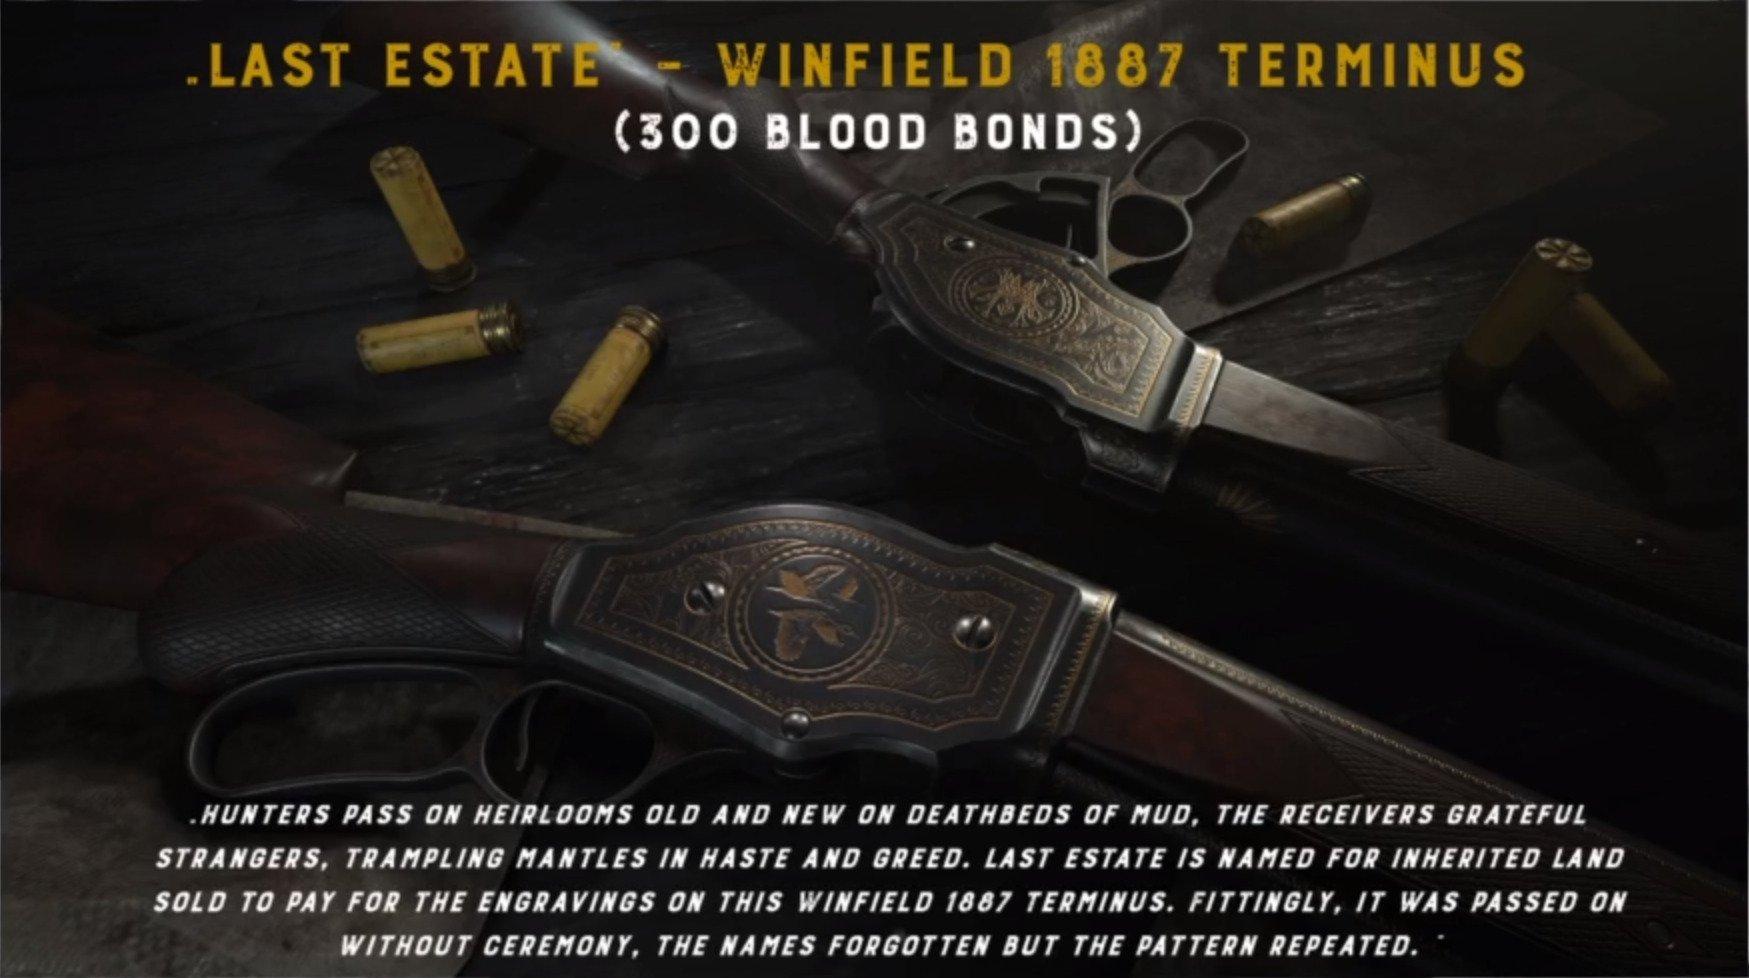 Winfield 1876 terminus